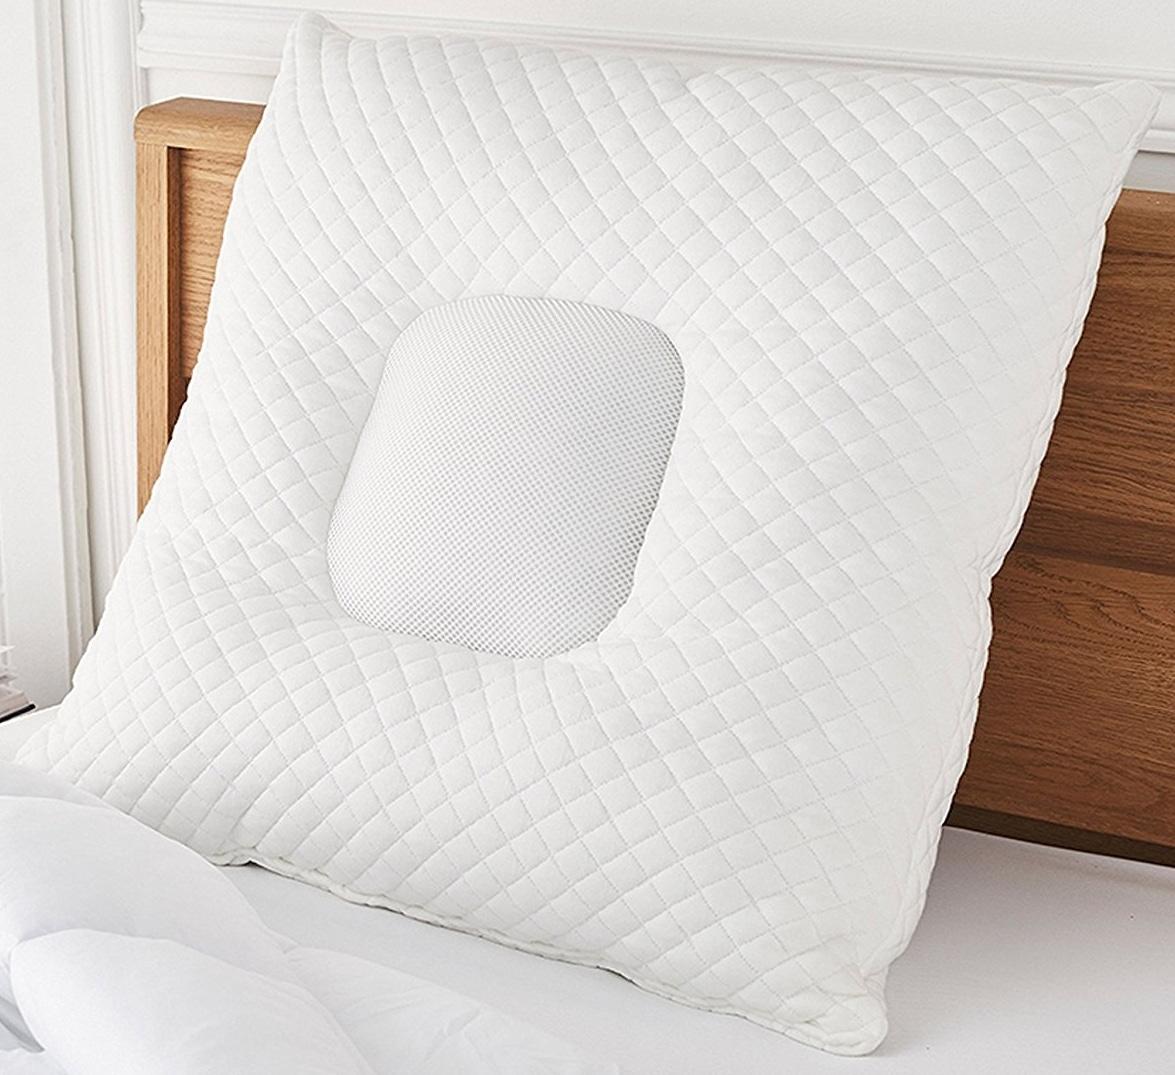 Oreiller ergonomique My Lovely Bed